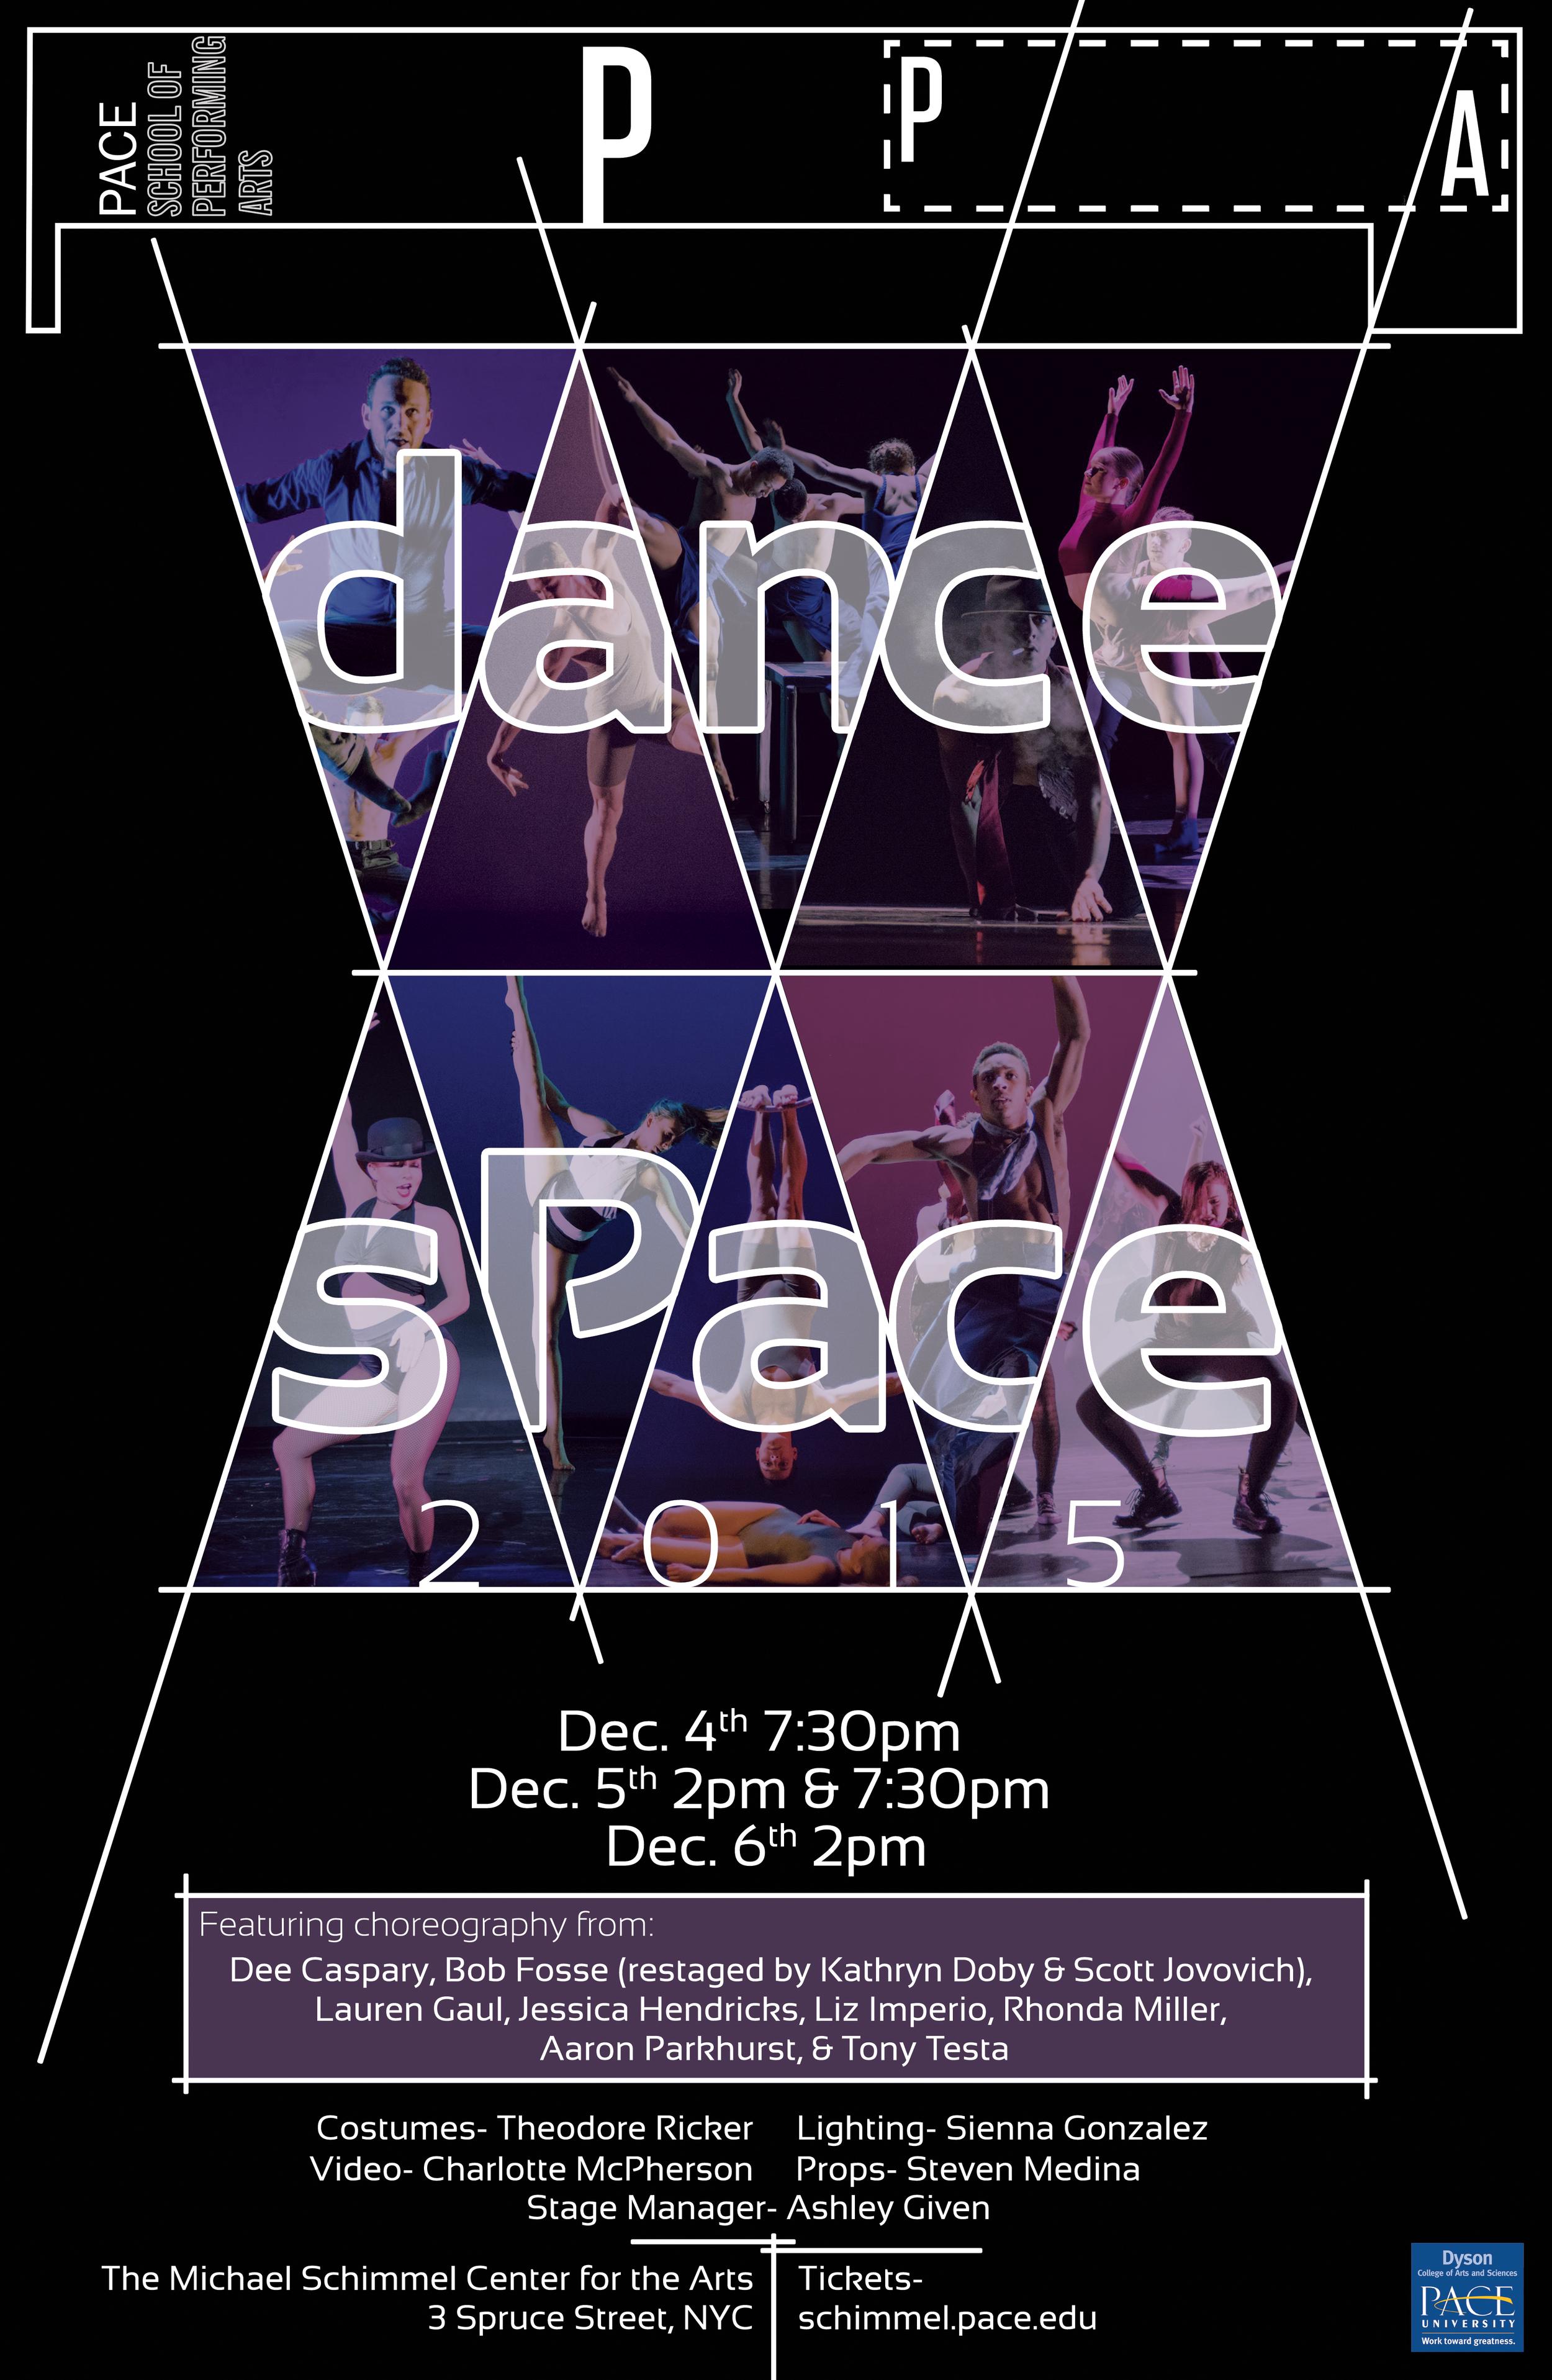 dancesPace_Final_Online.jpg